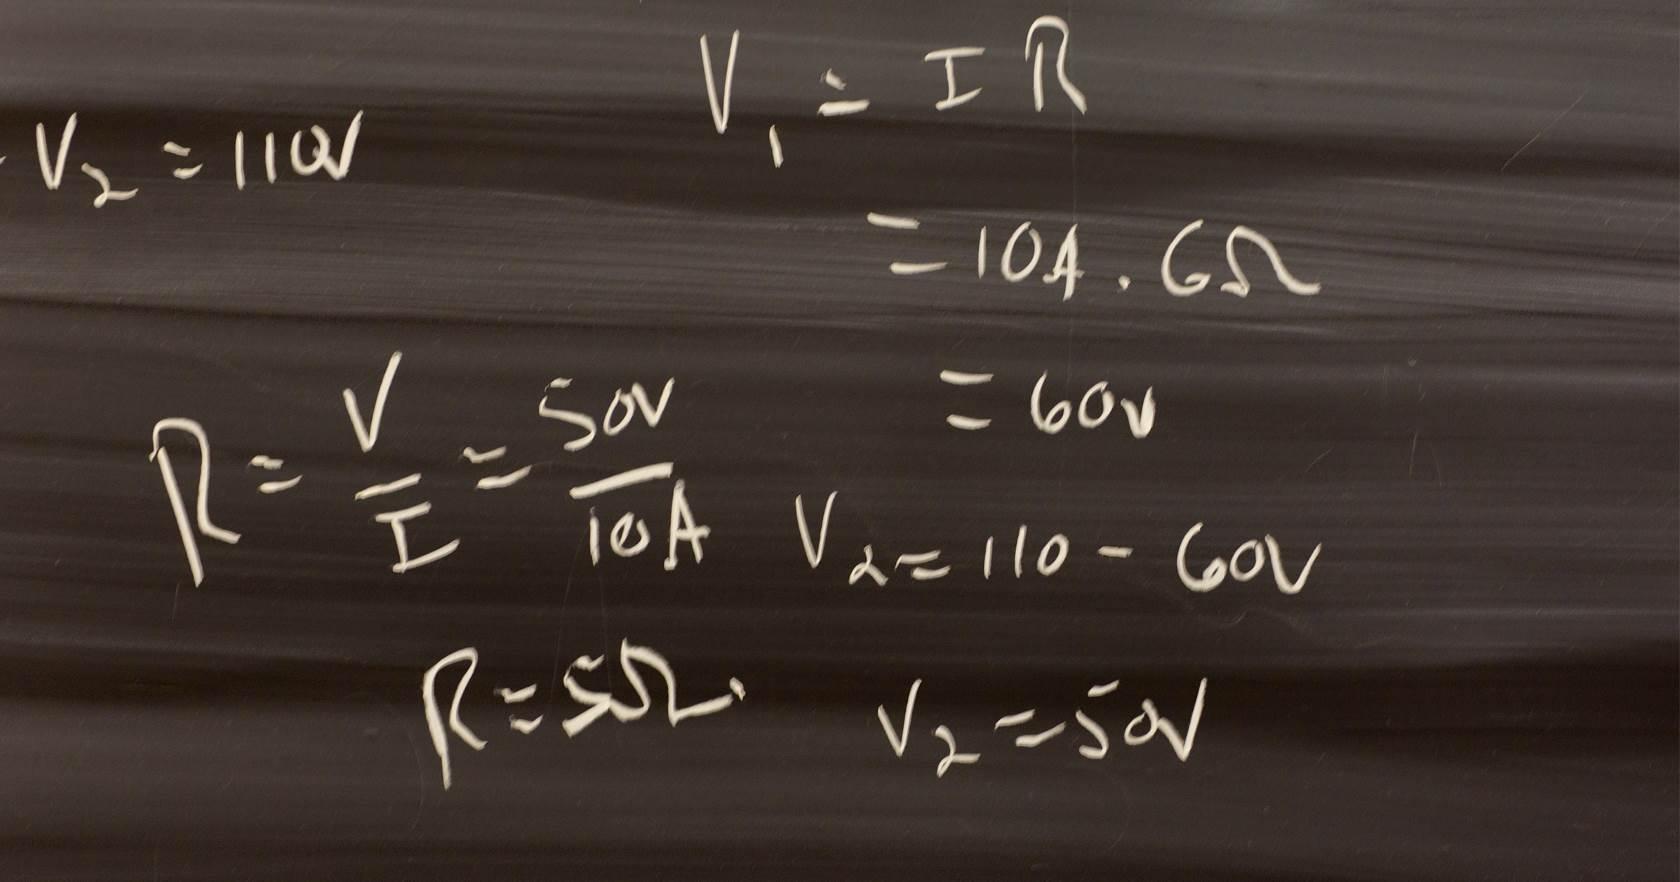 Formulas on a blackboard.